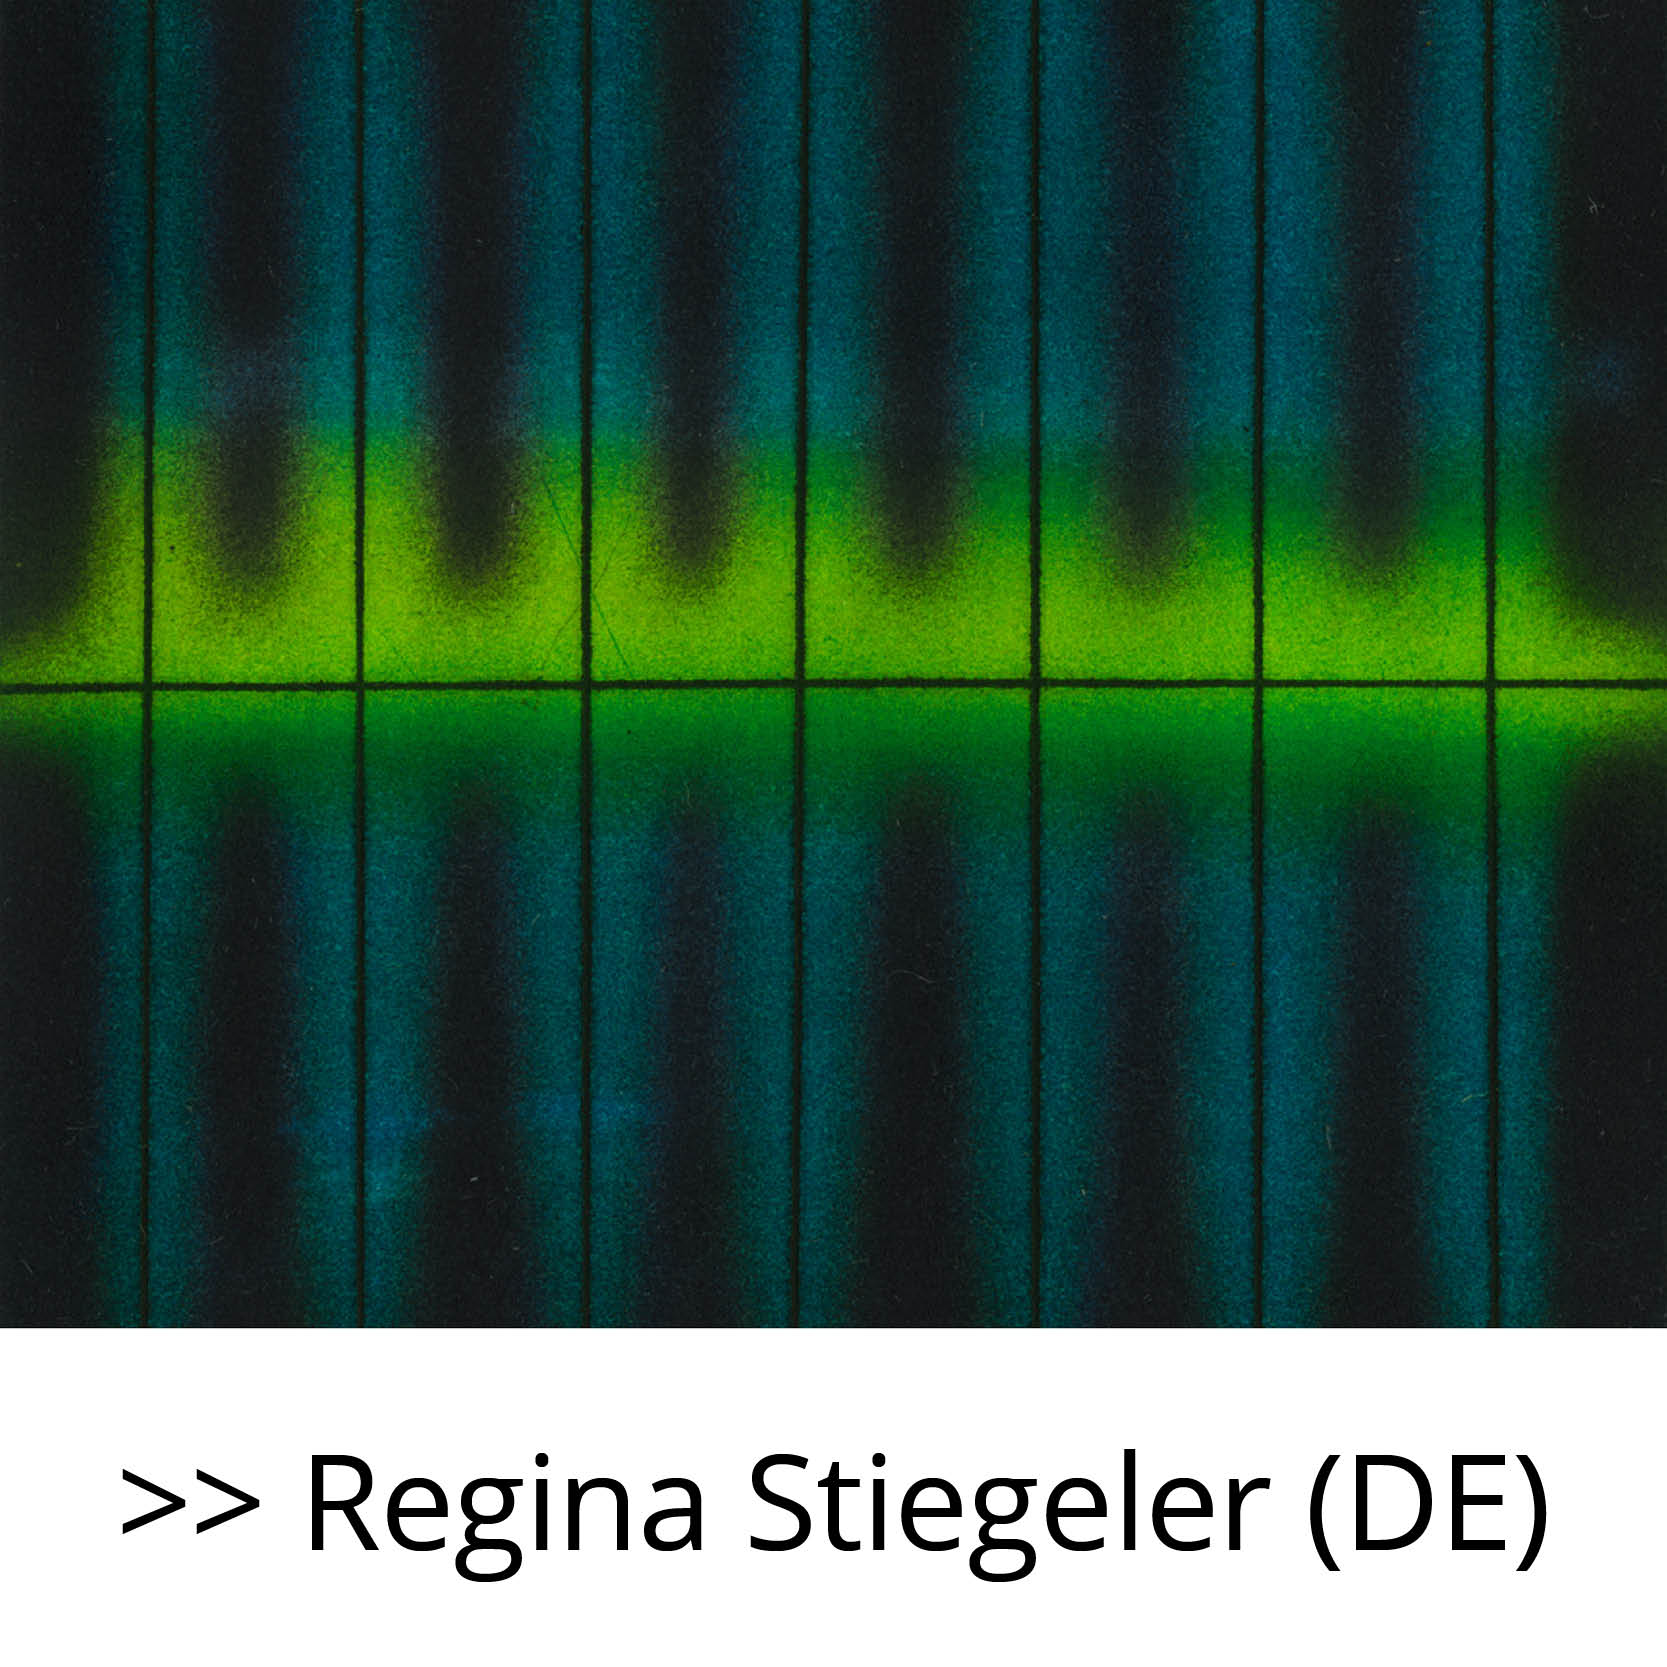 Regina_Stiegeler_(DE)